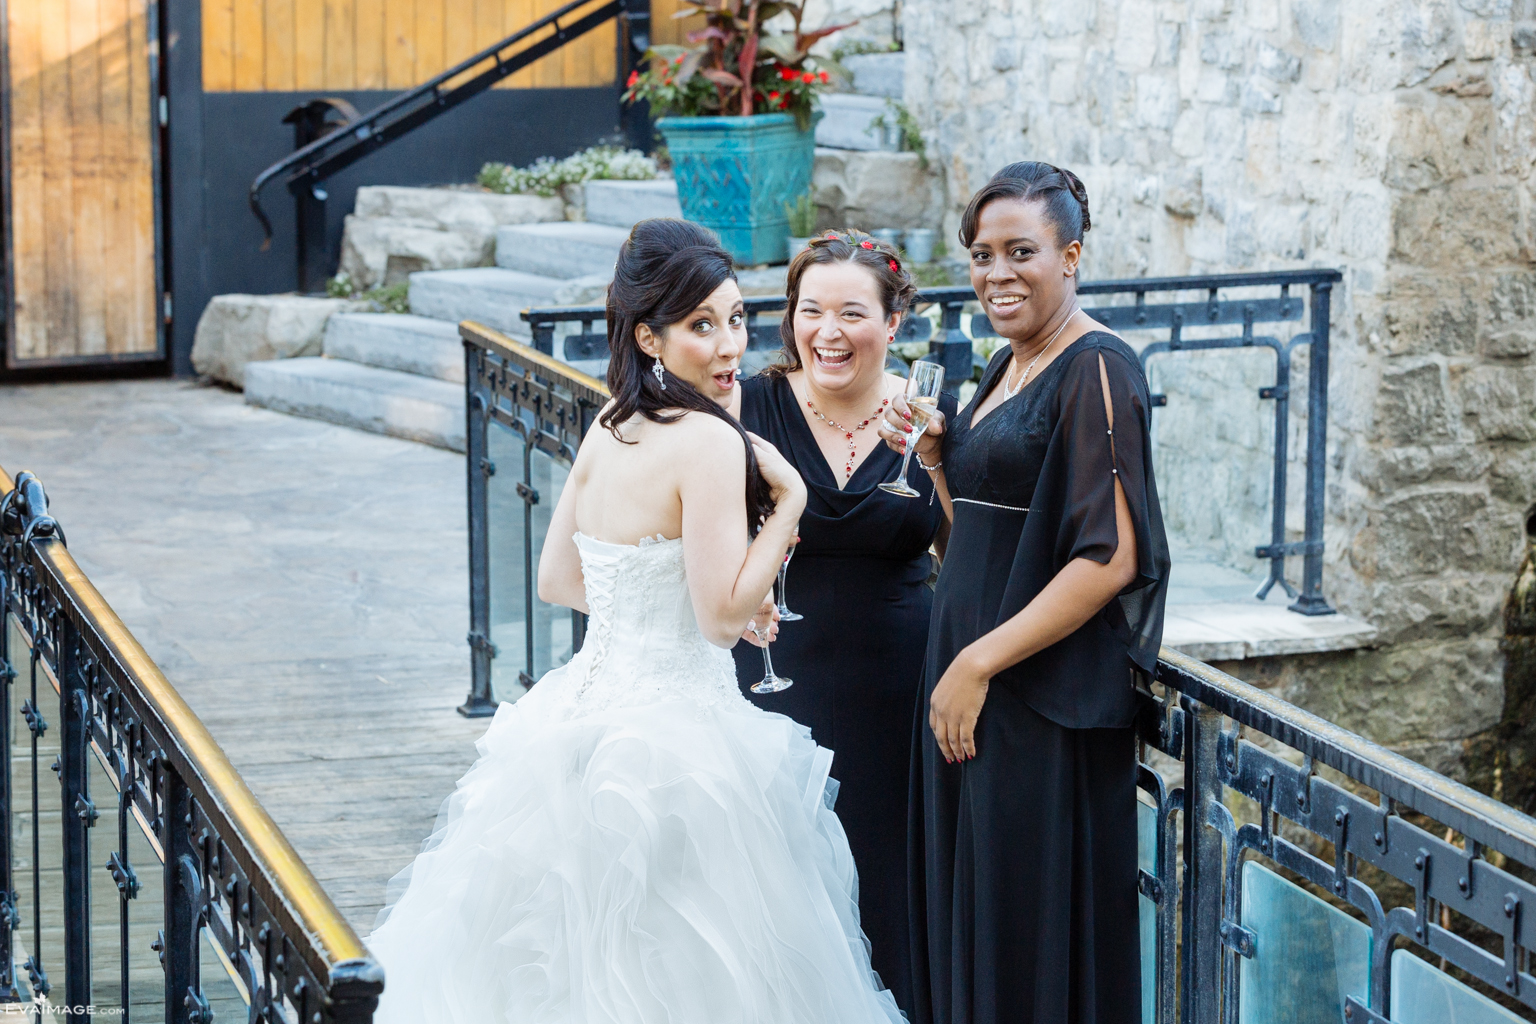 Ancaster_Mill_Wedding_EvaImage-409.jpg